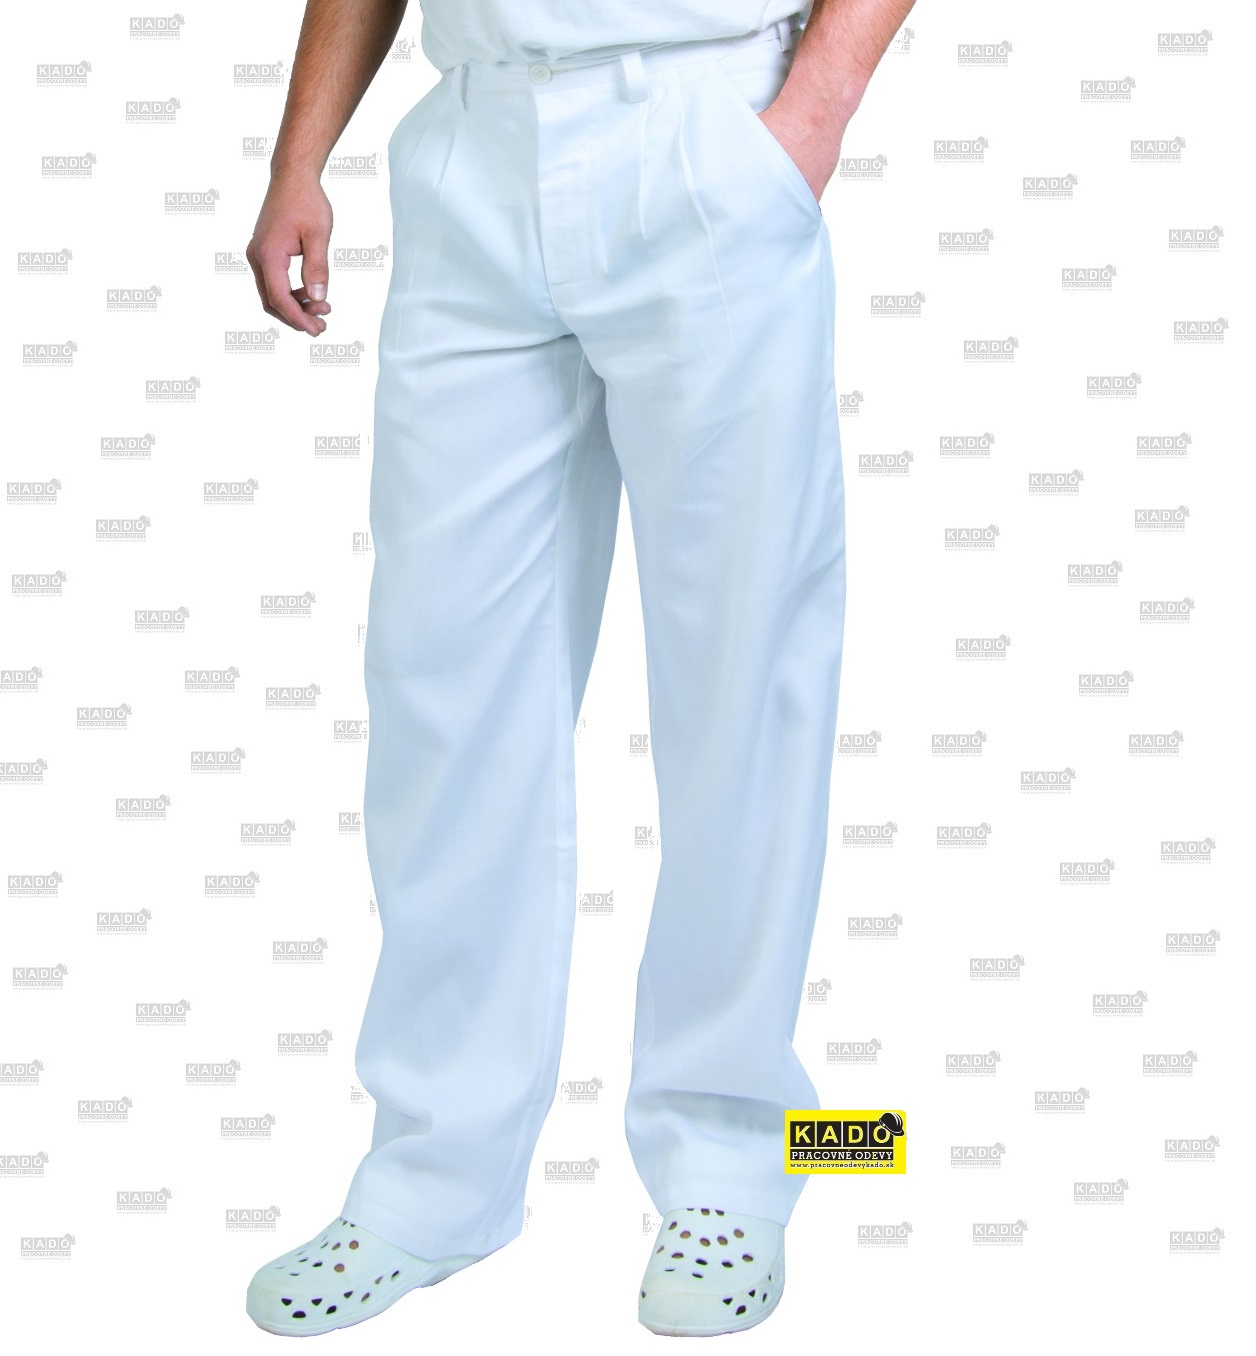 c66a1d702828 Pracovné odevy - Nohavice biele ARTUR CXS pánske